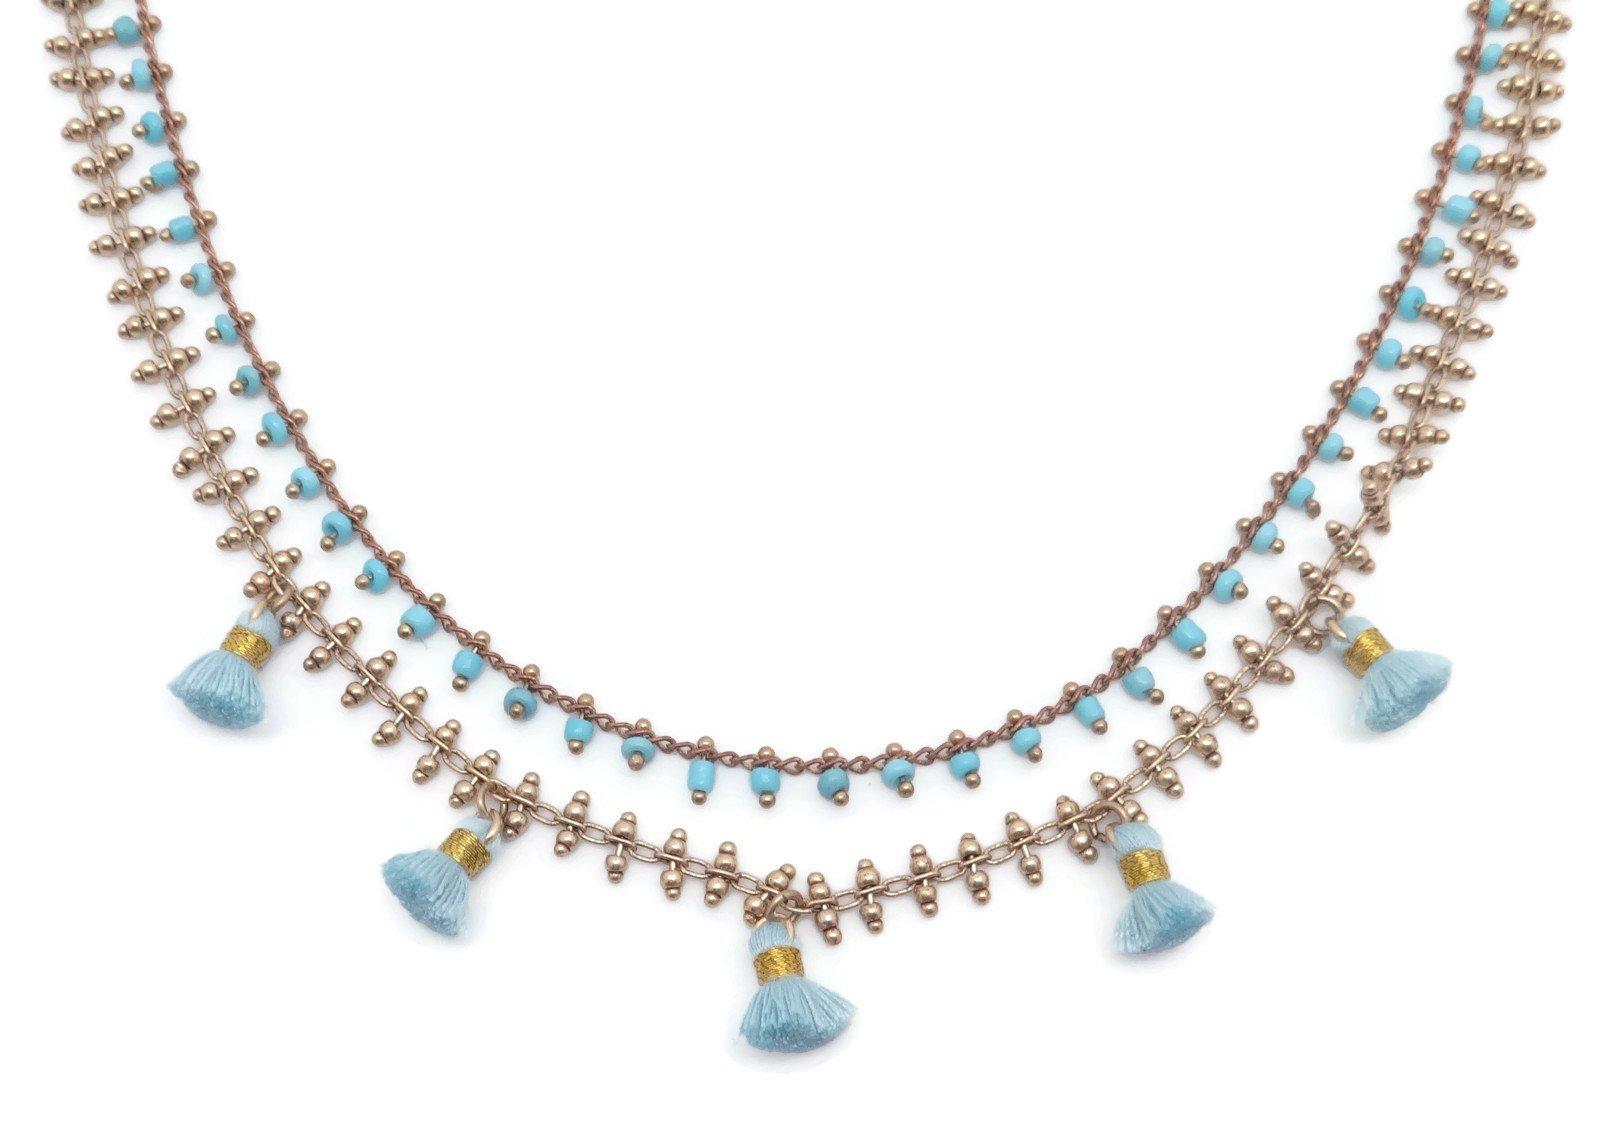 Catherine Popesco Aqua Beaded with Tassel Multi Strand Layered Goldtone Necklace